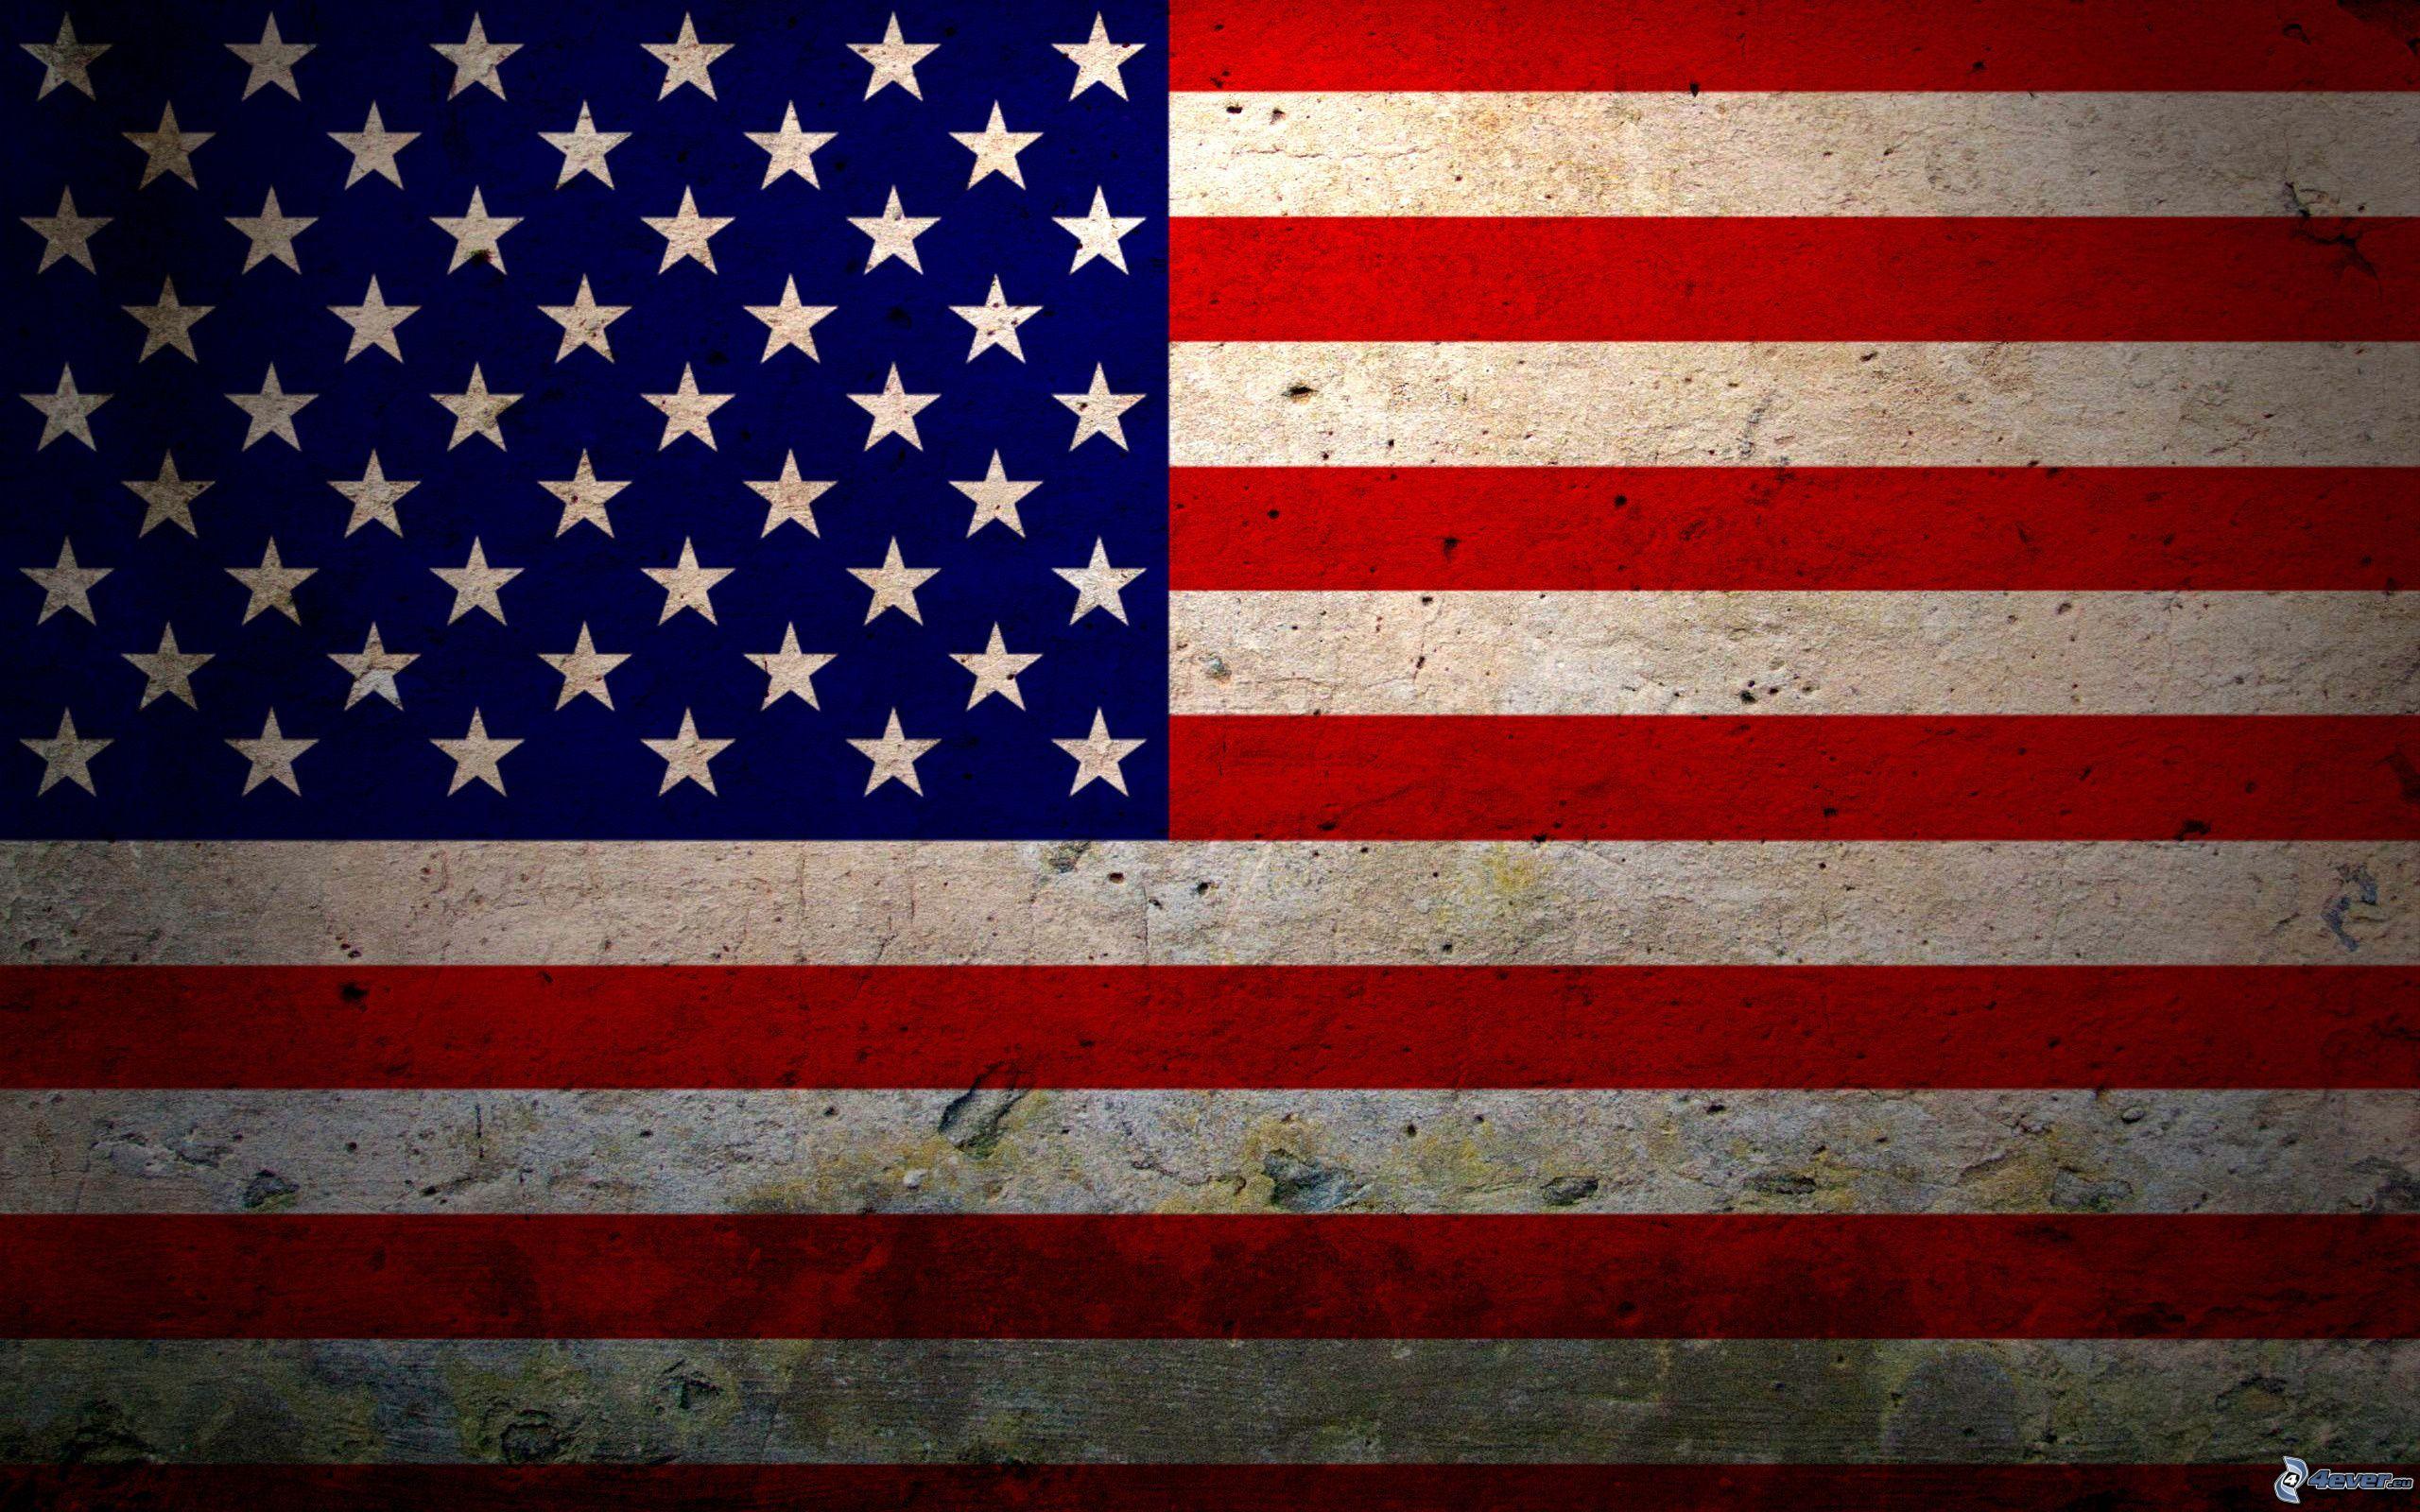 Pin By Nana Domi On Histoire Des Etats Unis American Flag Wallpaper Flags Wallpaper Usa Flag Wallpaper